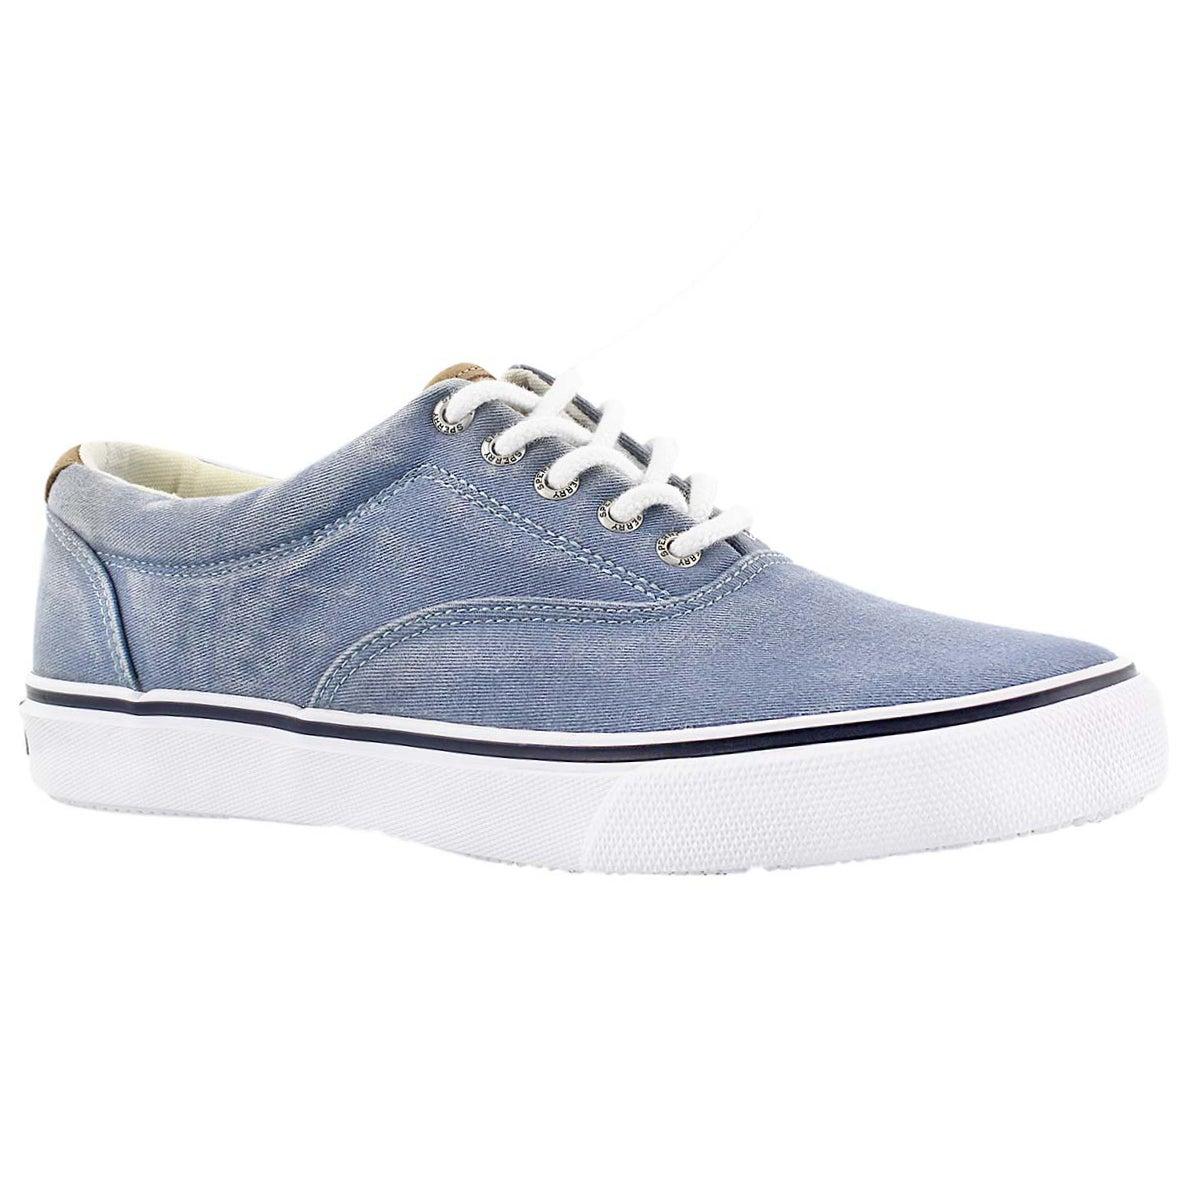 Men's STRIPER CVO blue sneakers